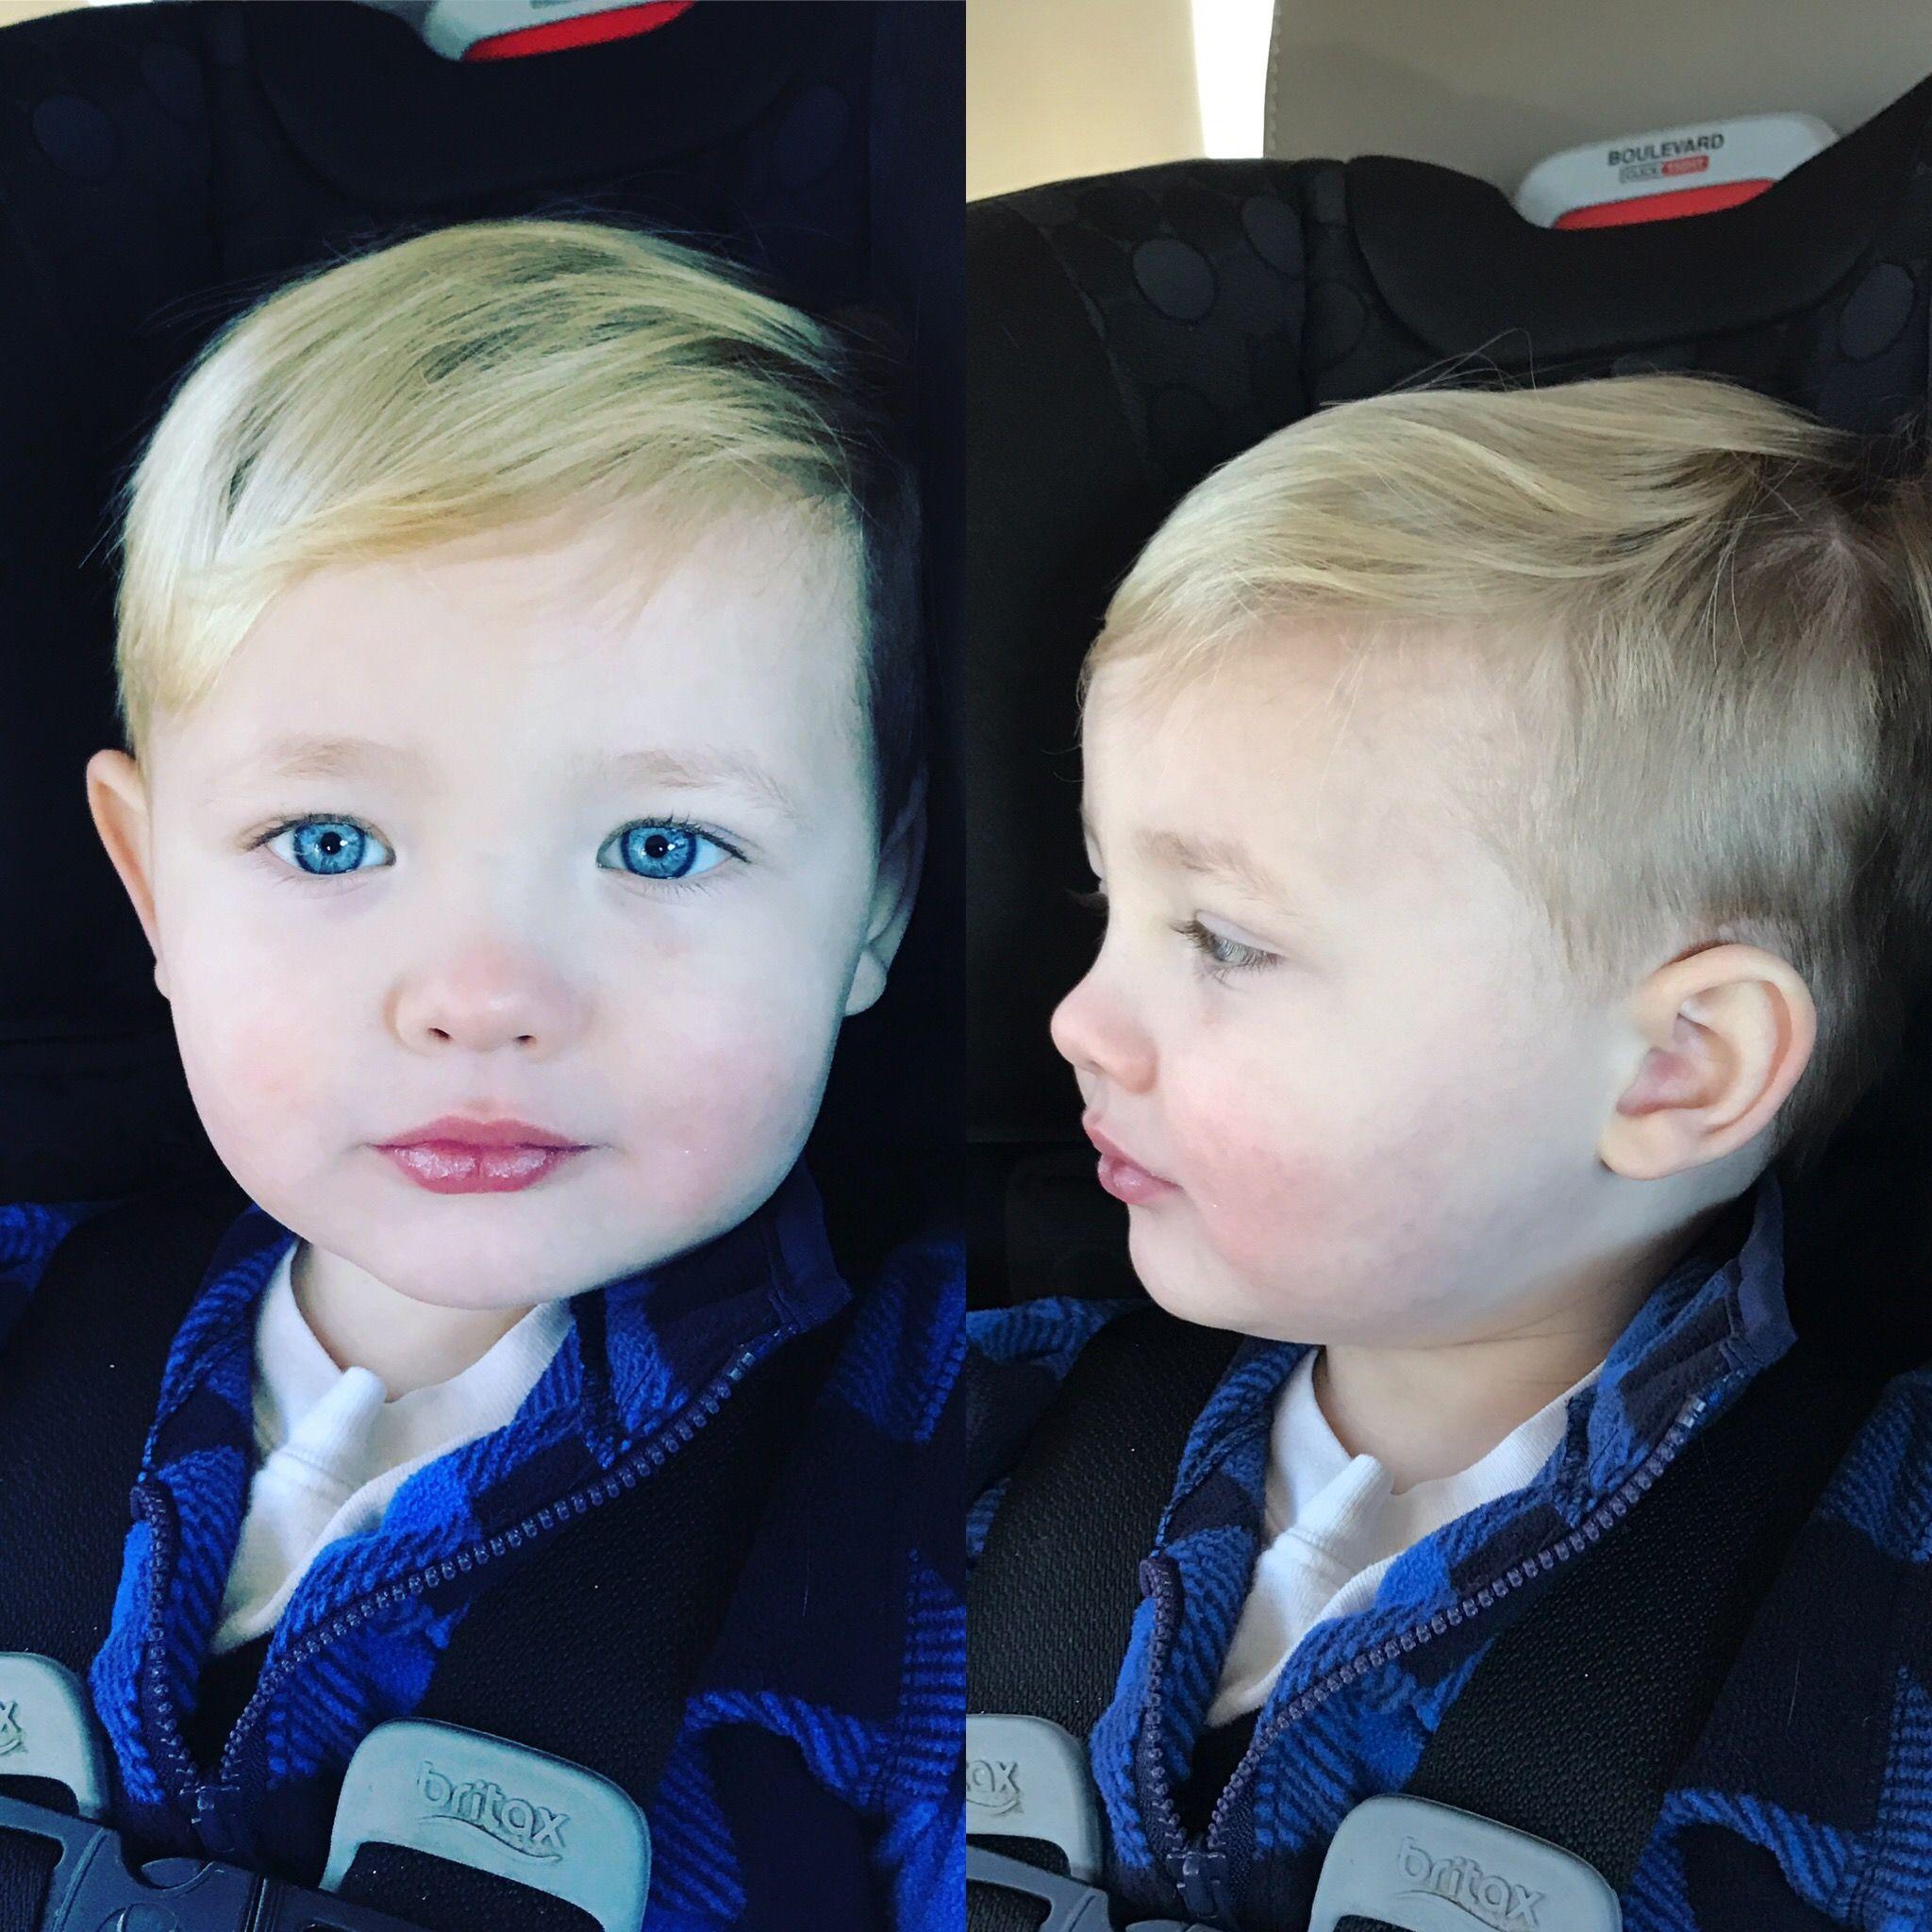 baby hair blonde thin cut haircut hairstyle toddler 2017